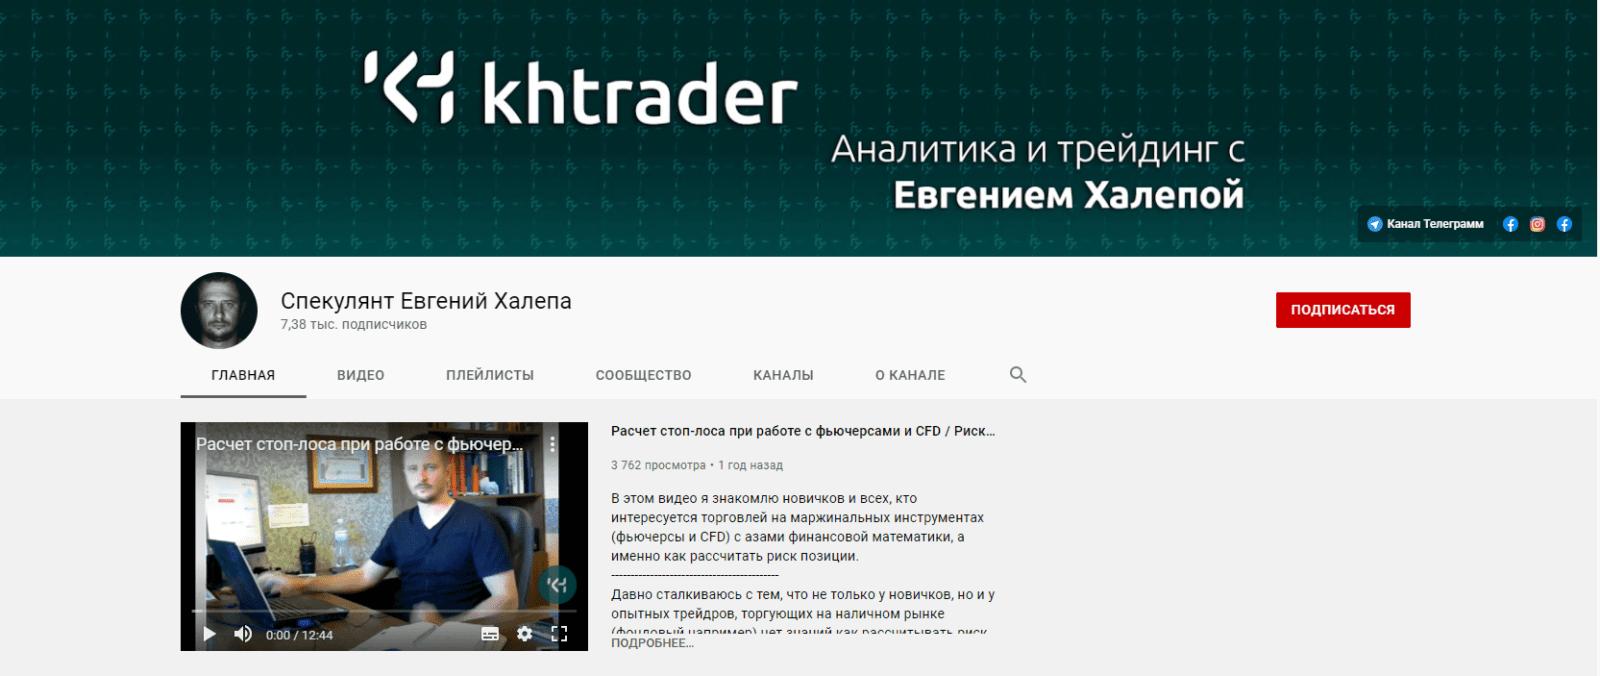 Ютуб-канал трейдера Евгения Халепы